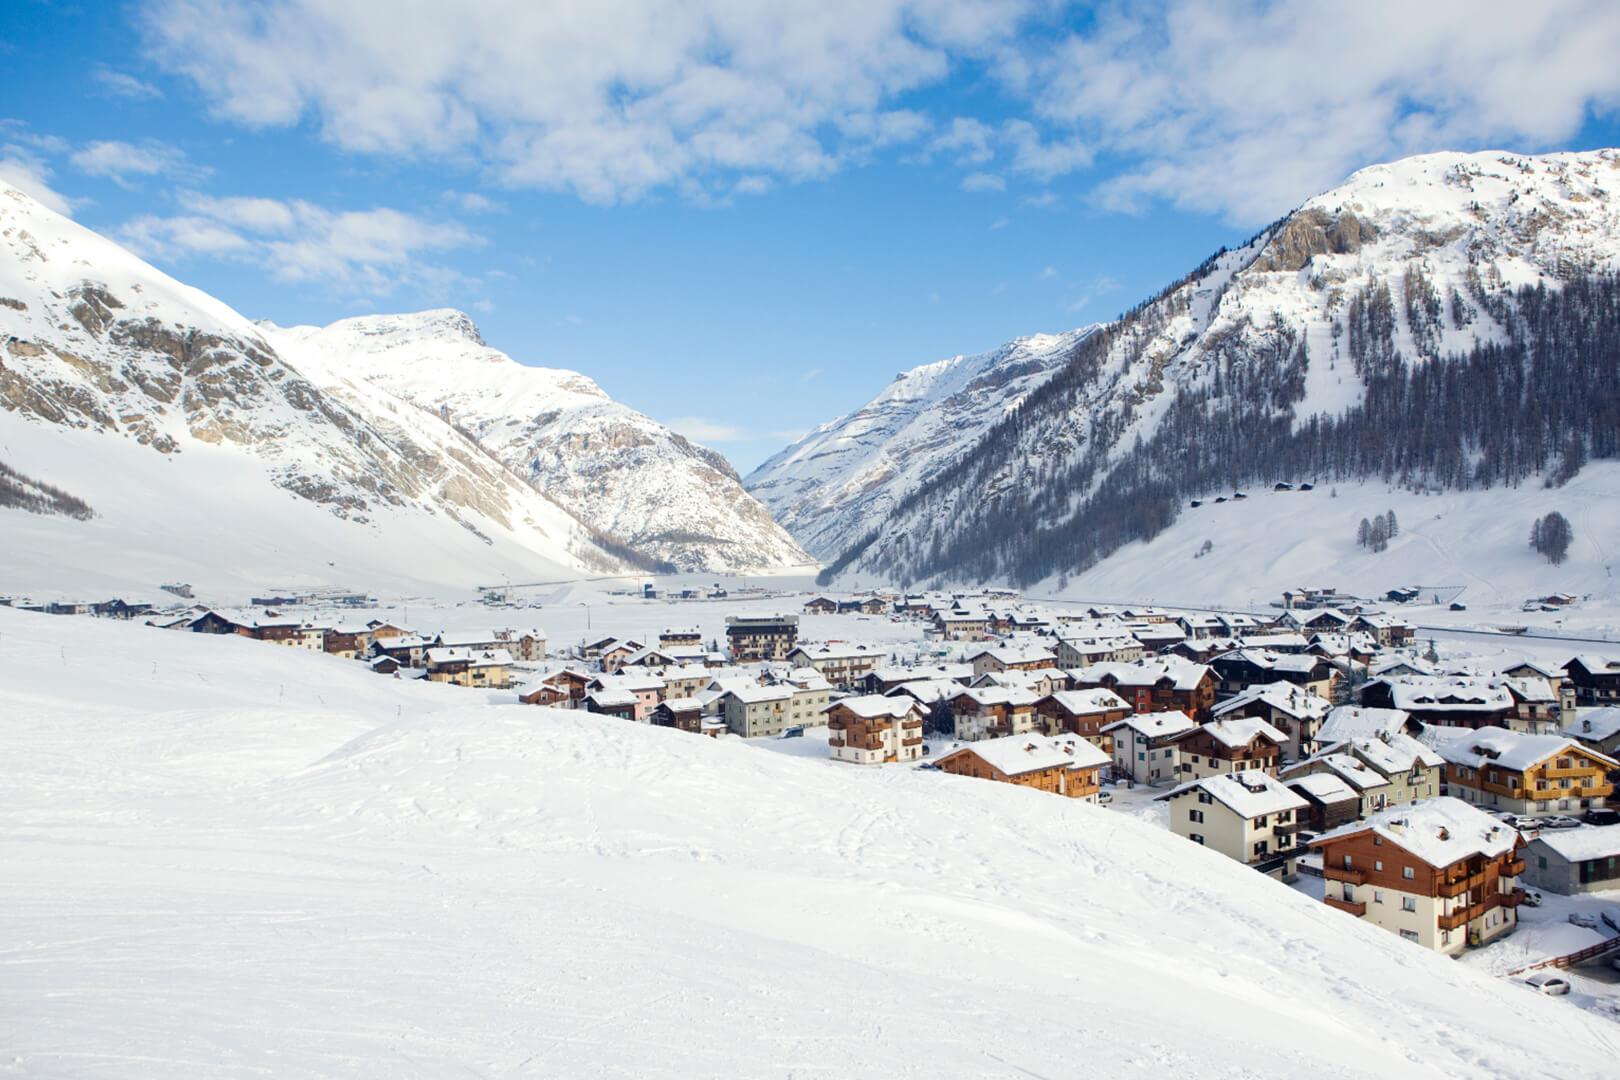 panoramica invernale su Bormio